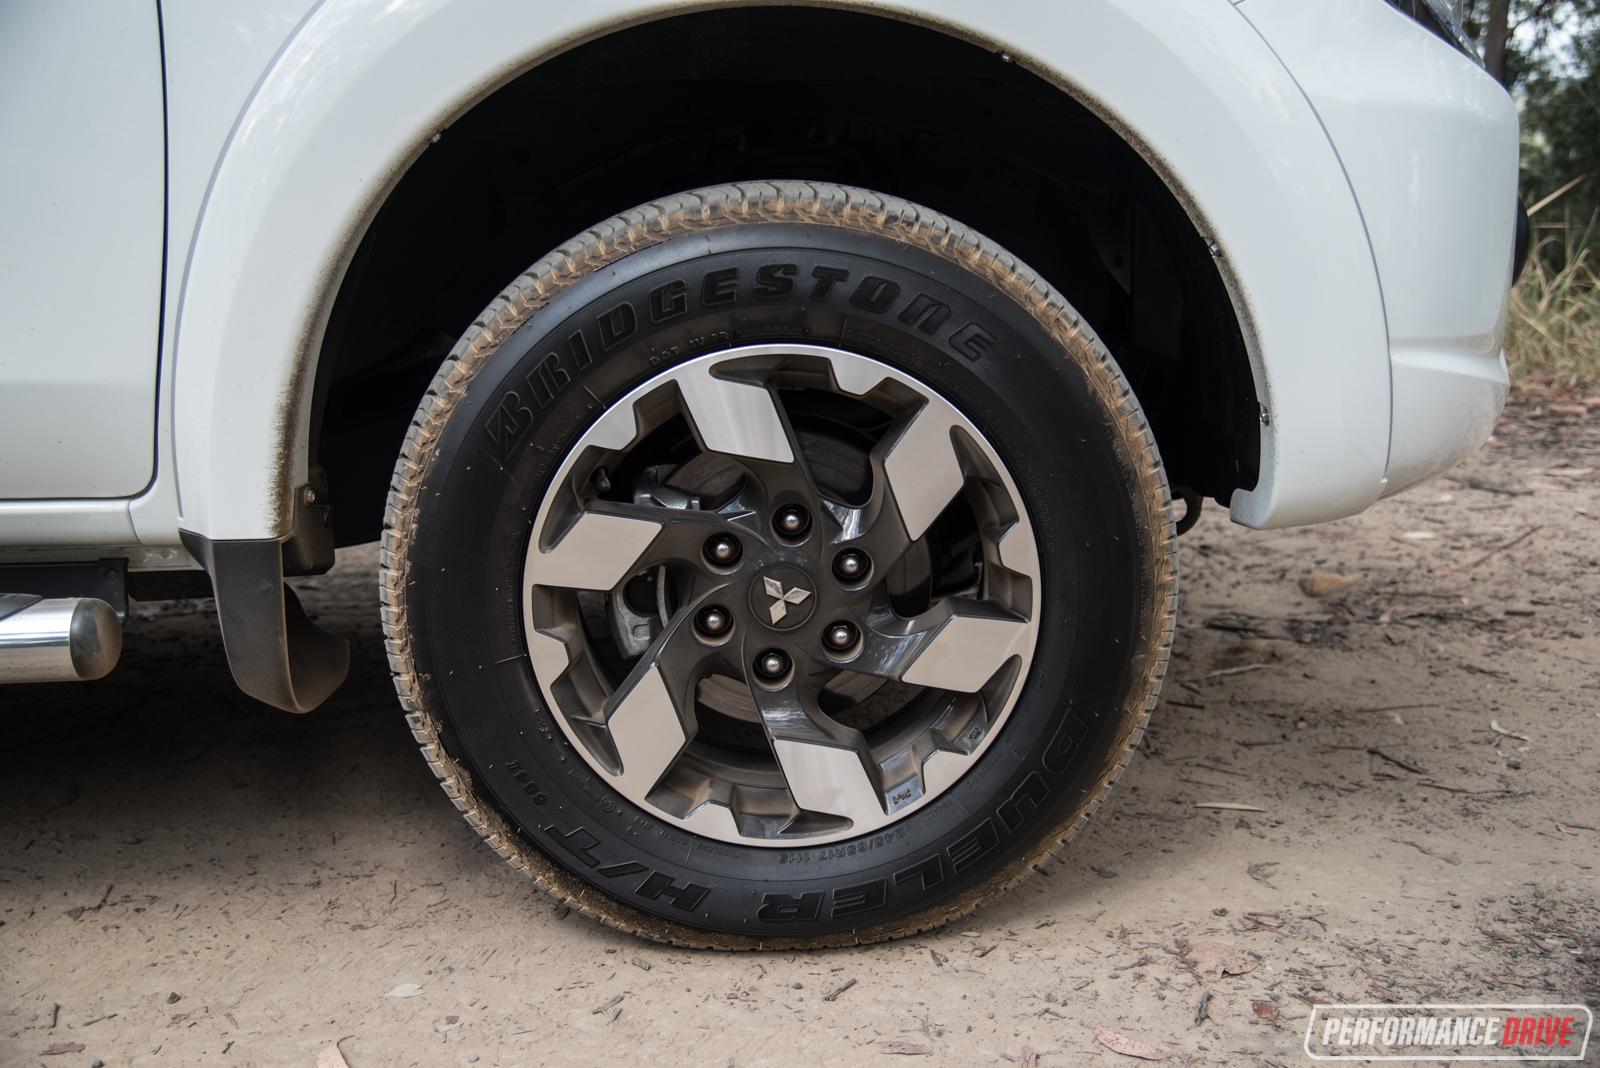 2016 Mitsubishi Triton Exceed Wheels